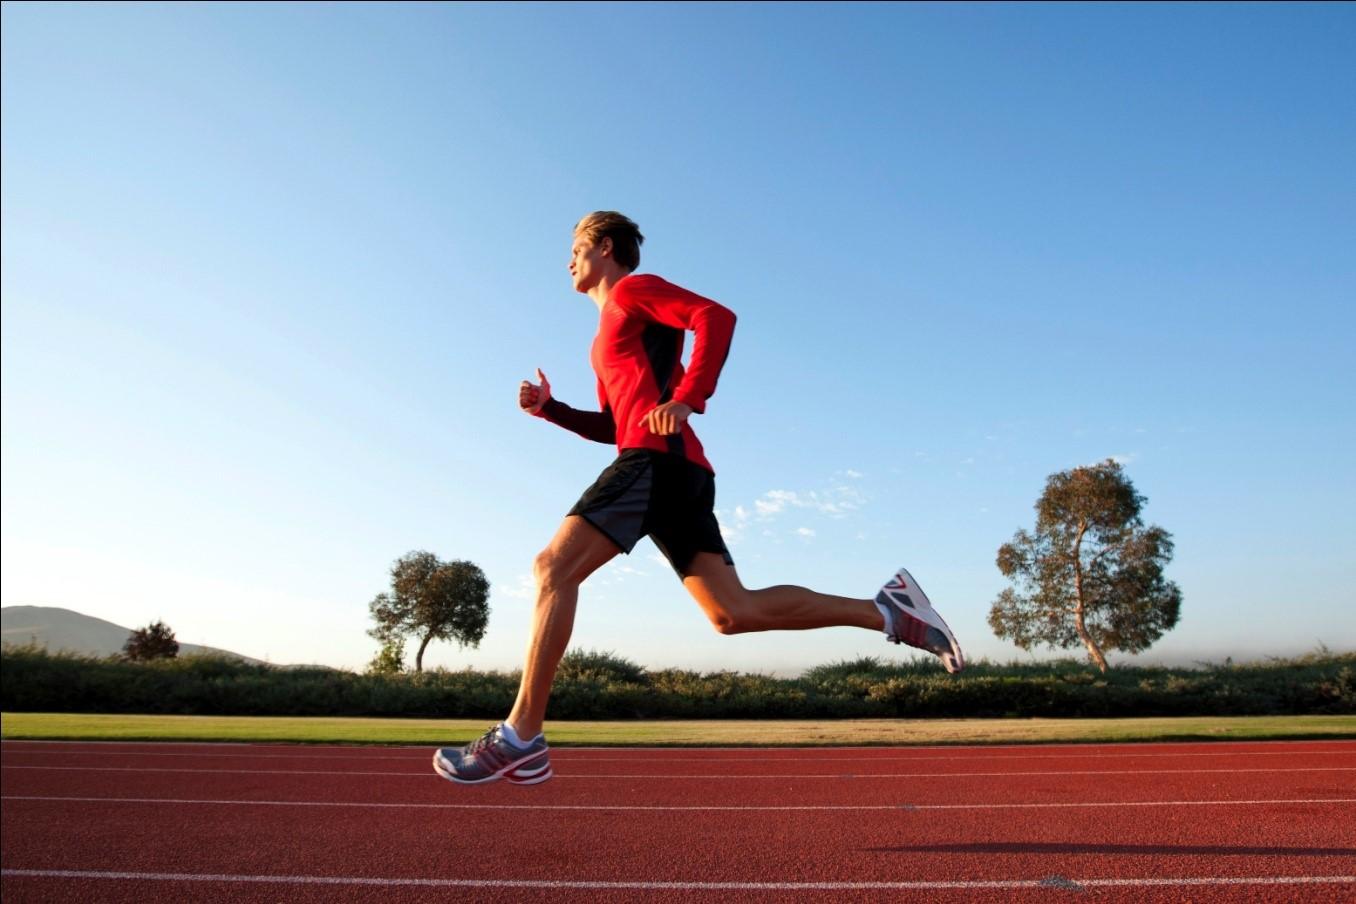 Mampu Bakar lebih Banyak Kalori, Ini 3 Olahraga Terbaik yang Wajib Kamu Coba!